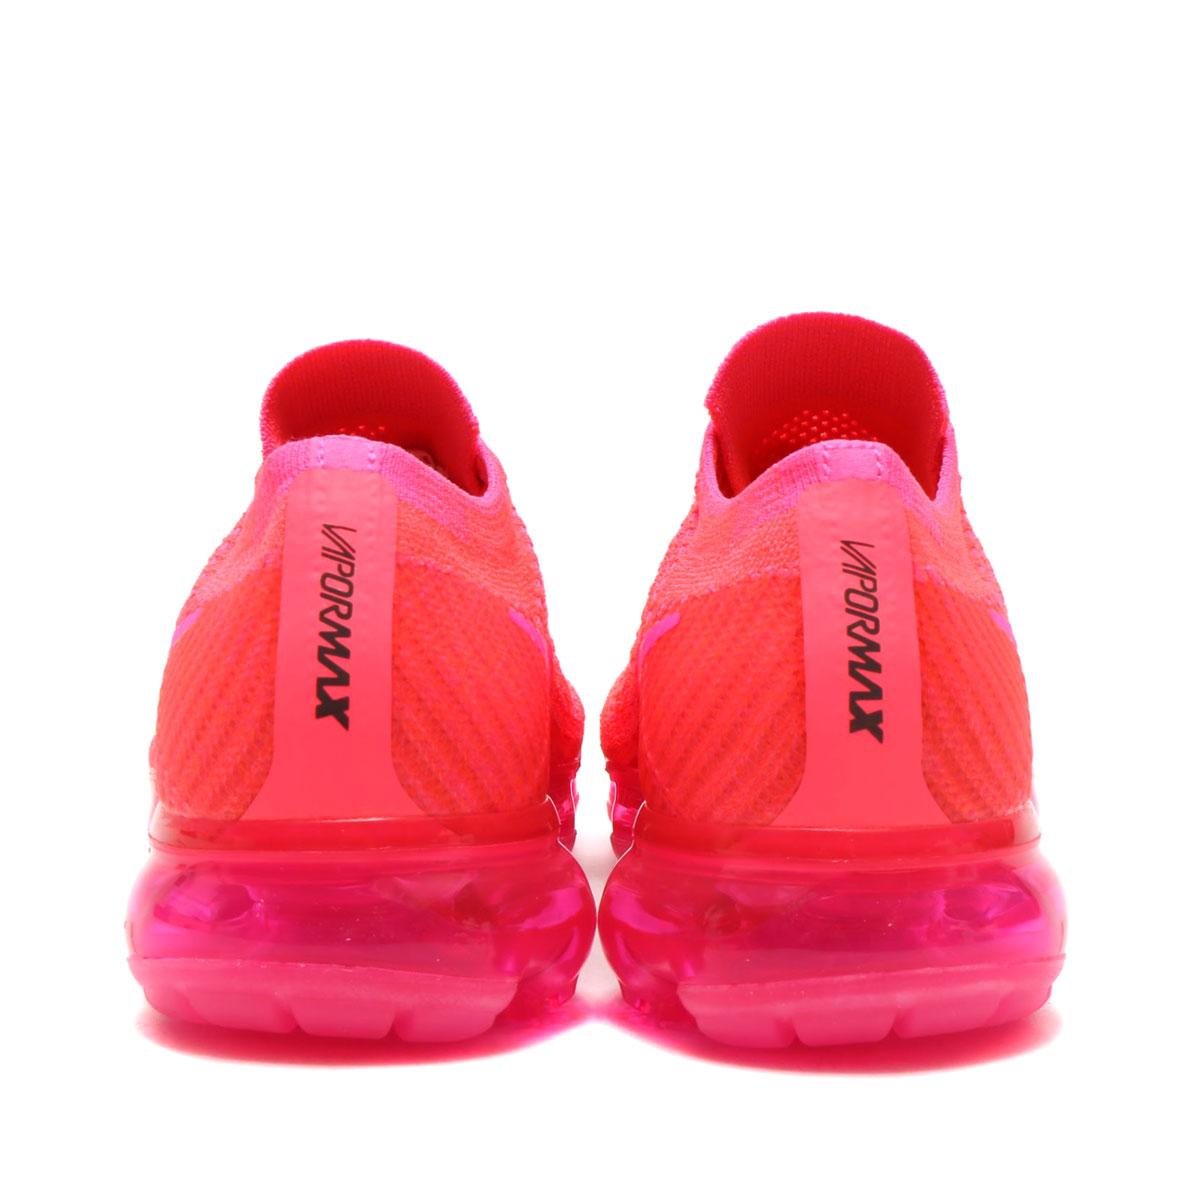 a138c2166d89 NIKE WMNS AIR VAPORMAX FLYKNIT (Nike women air vapor max fried food knit) (HYPER  PUNCH PINK BLAST-HOT PUNCH-BLACK) 18SP-S